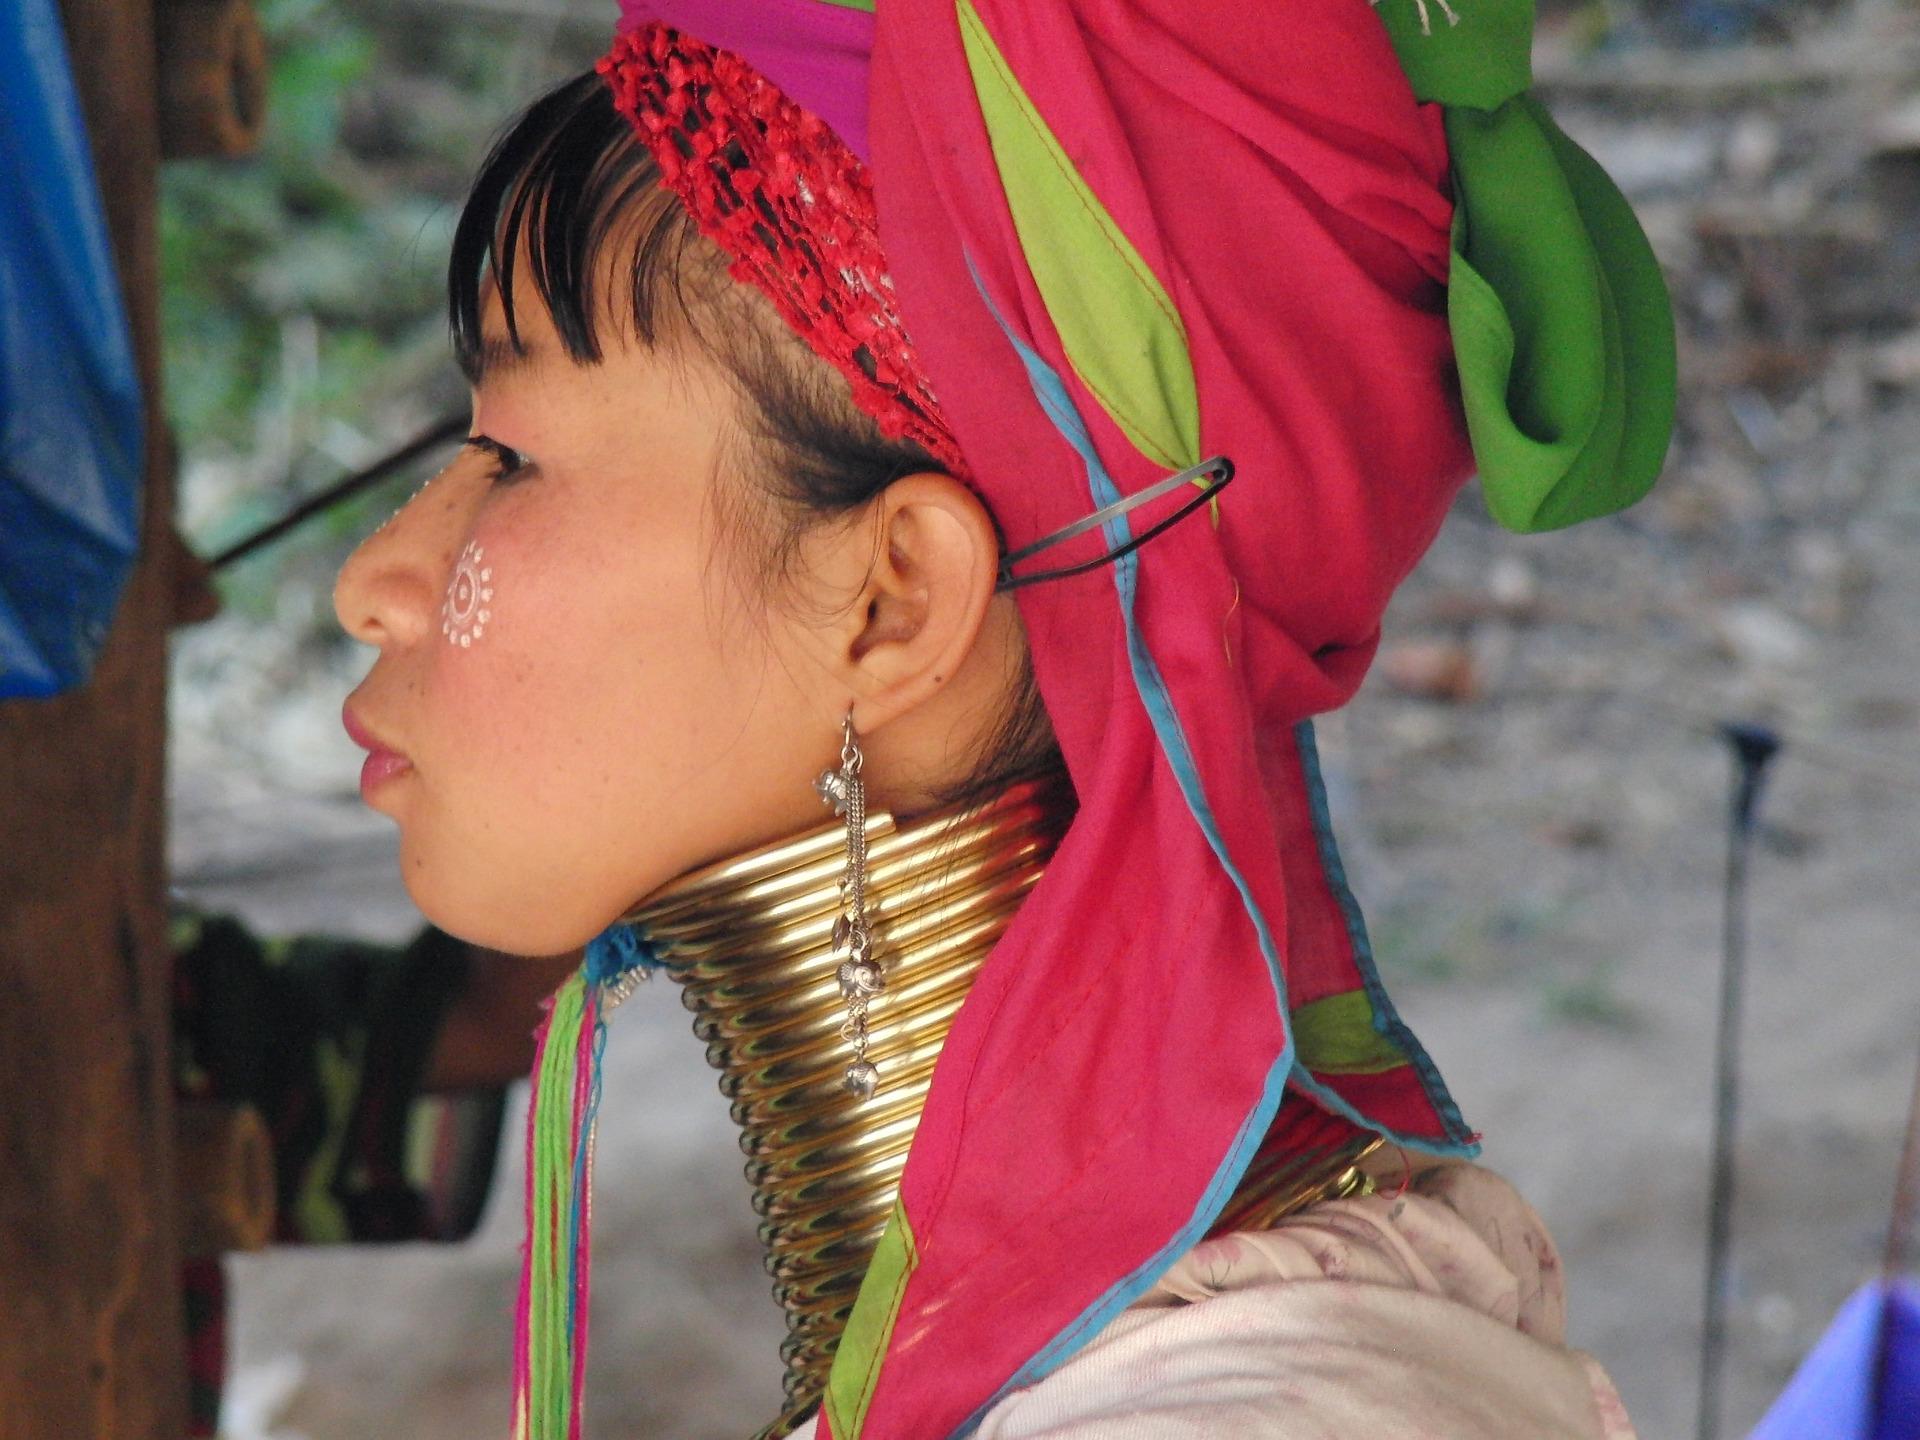 thailand-686674_1920.jpg